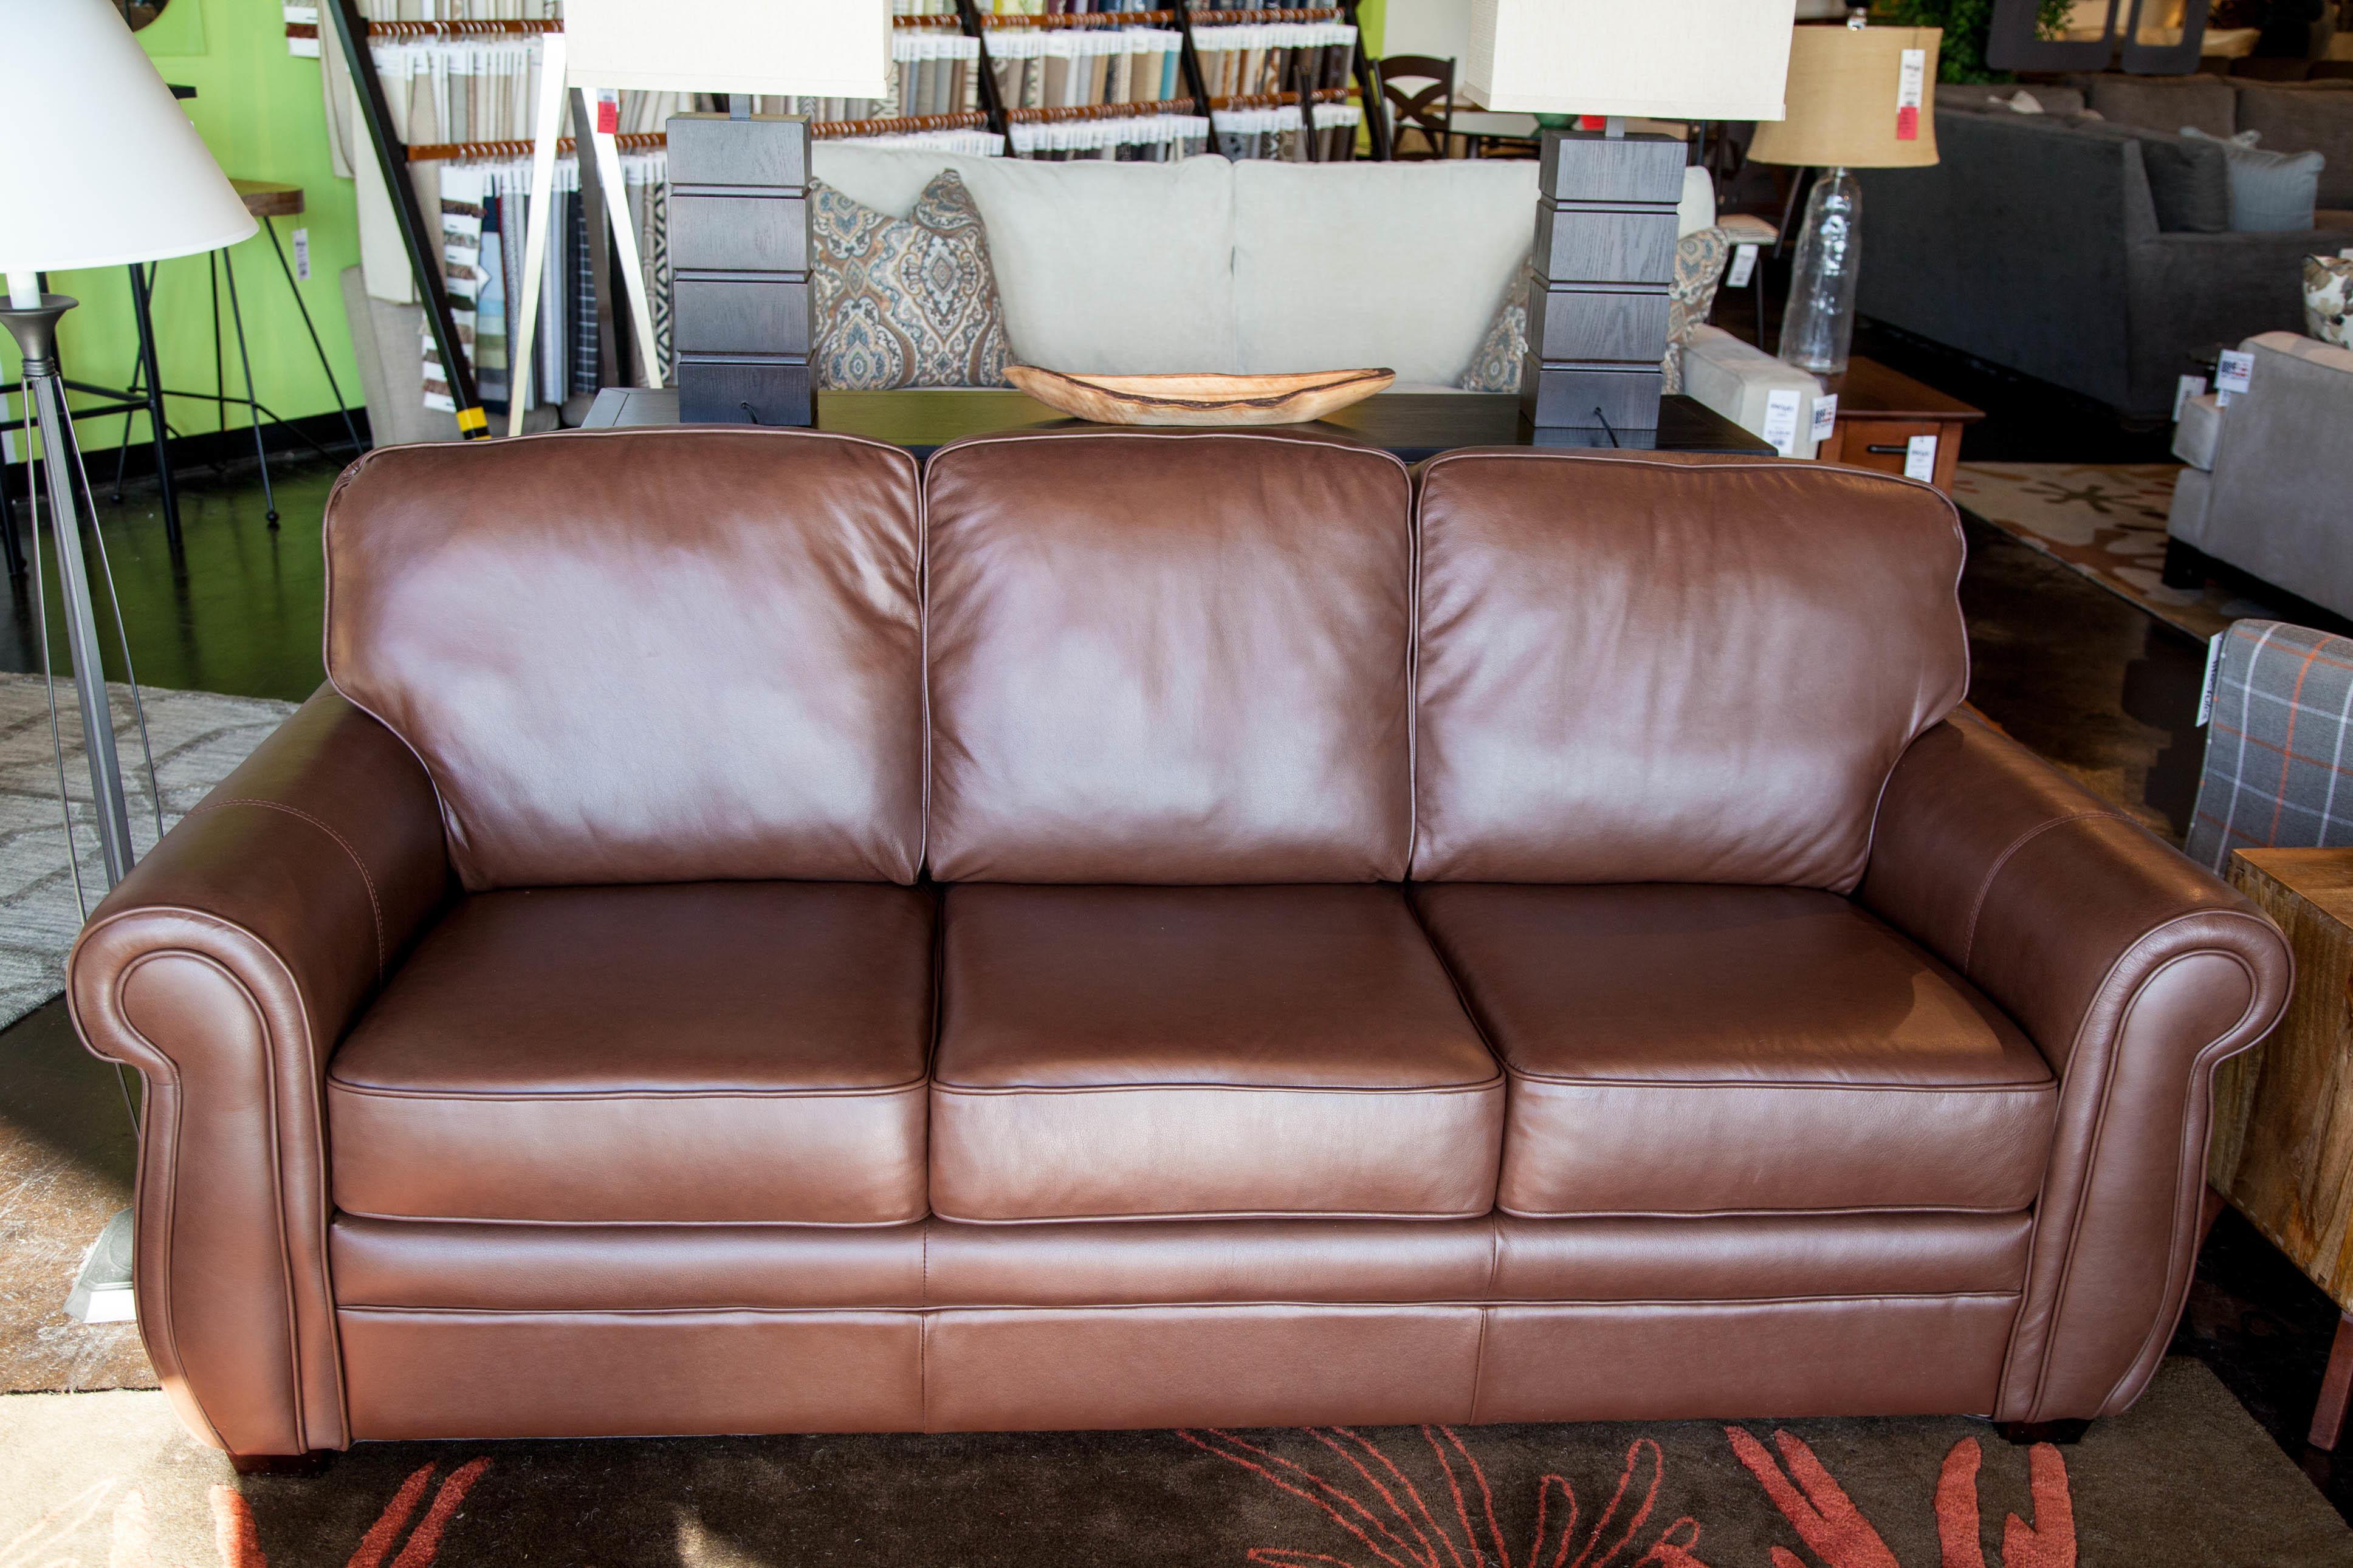 lifestyles furniture columbia missouri mo. Black Bedroom Furniture Sets. Home Design Ideas